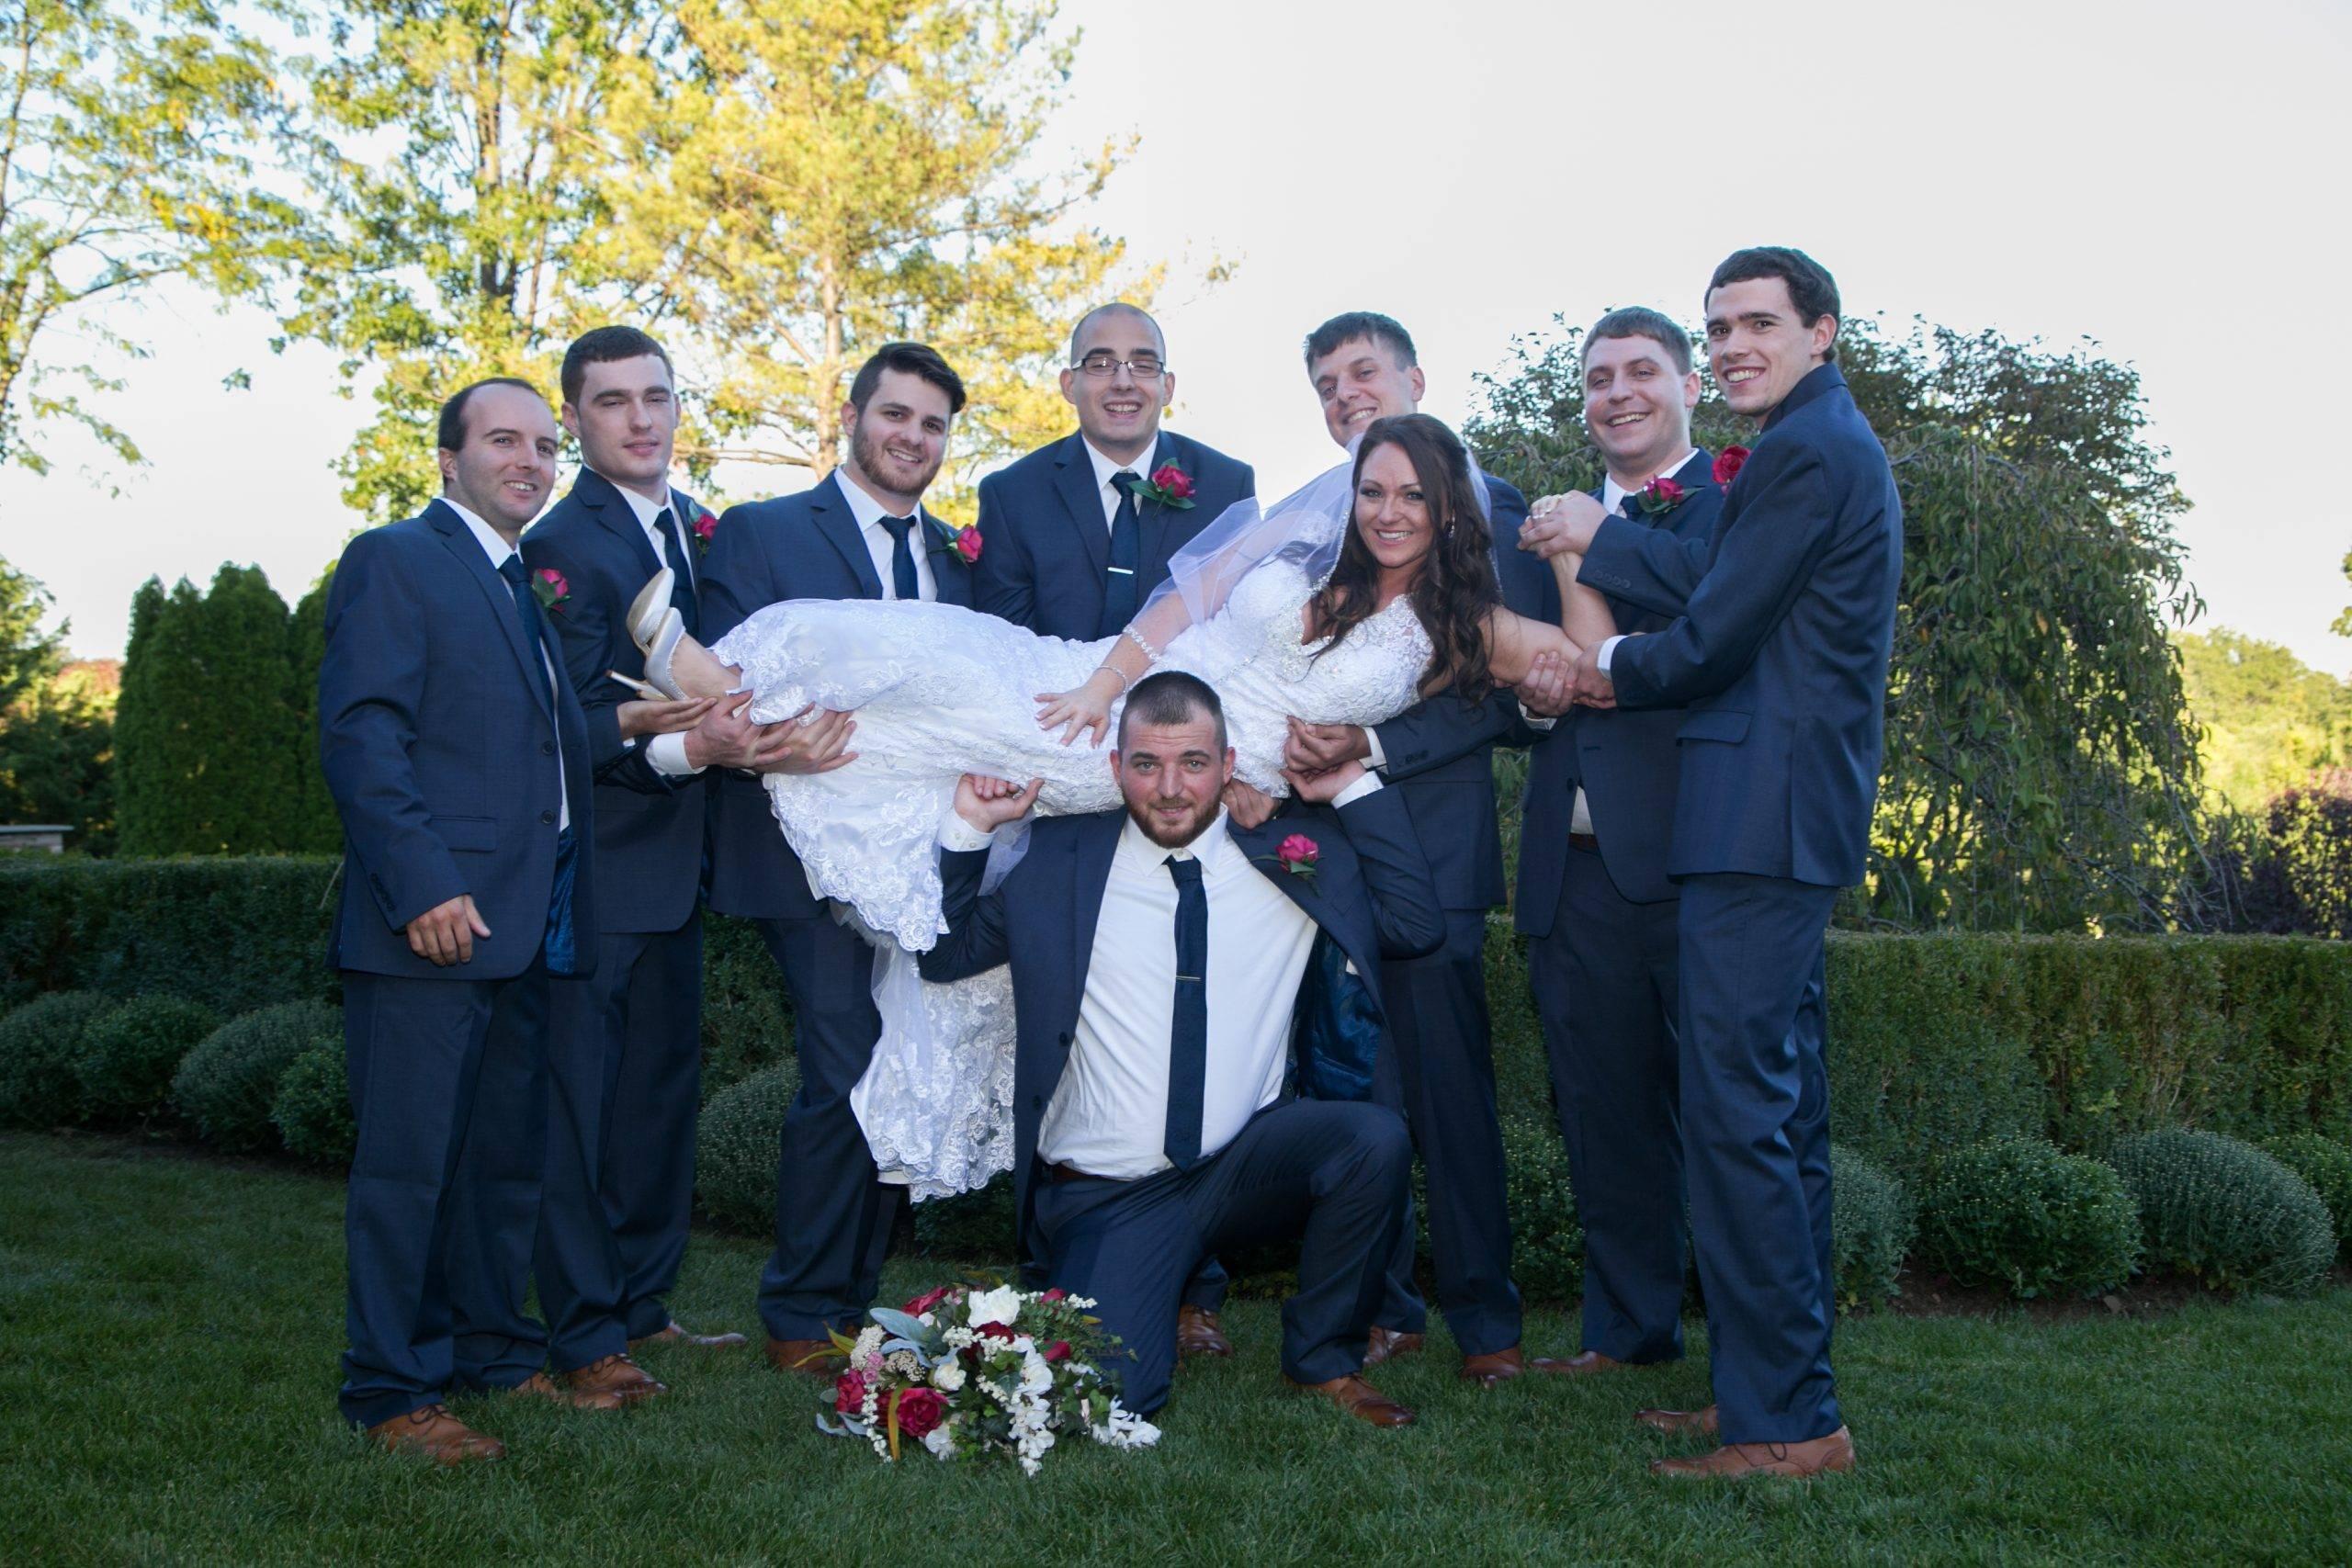 Park Savoy groomsmen with bride